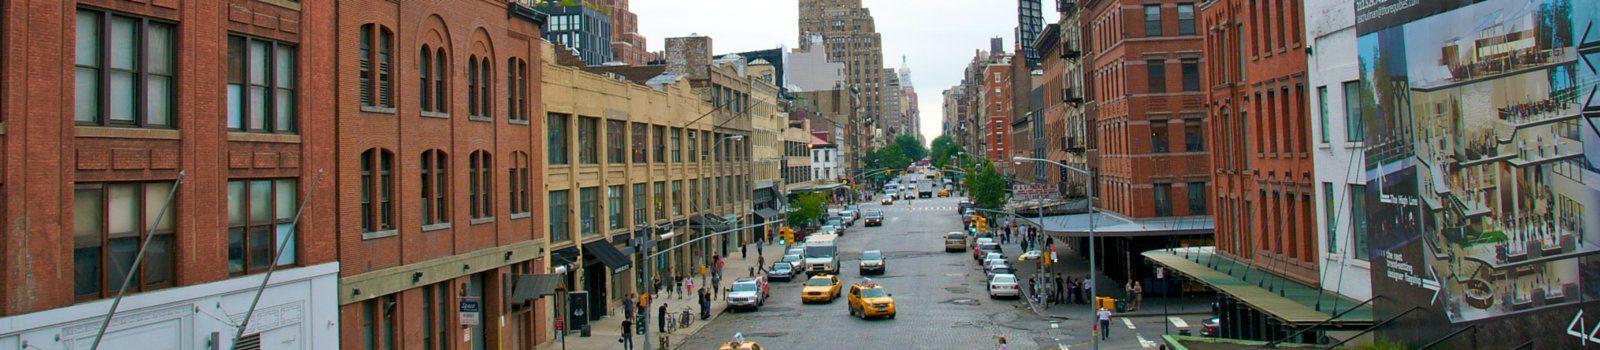 Chelsea High Line Park Header